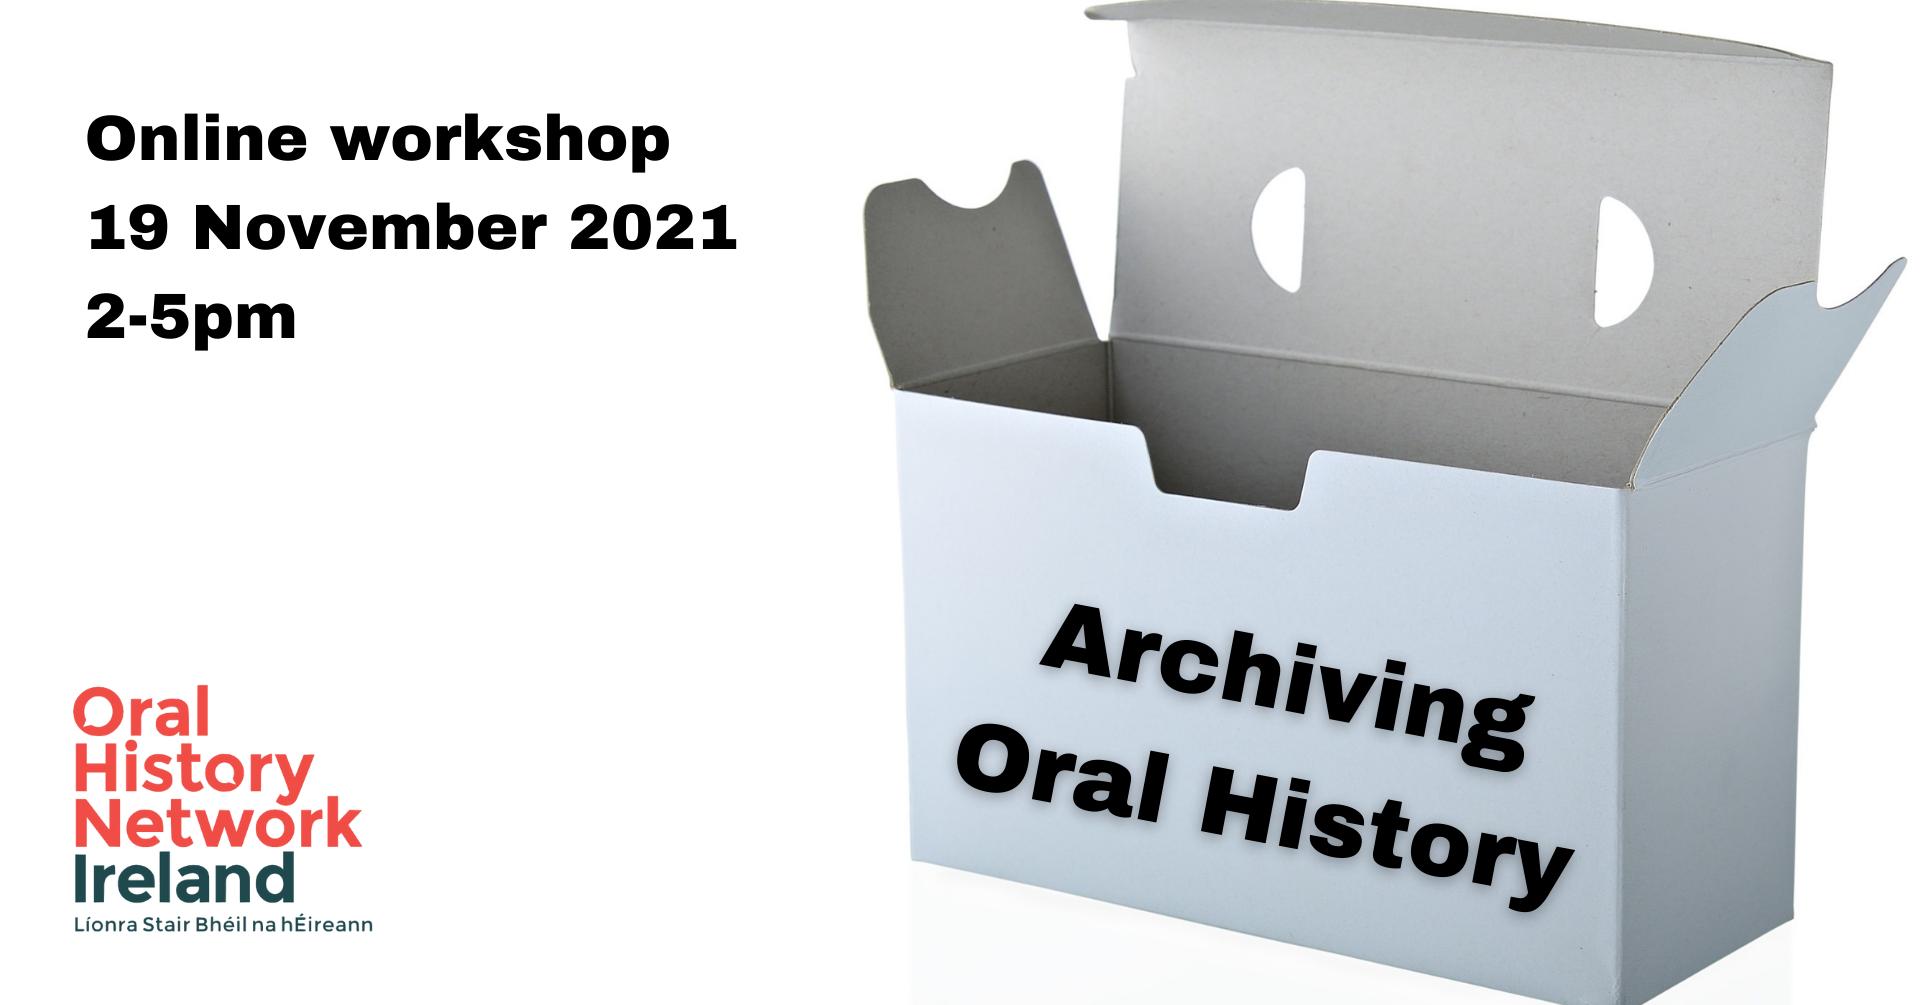 Archiving Oral History workshop